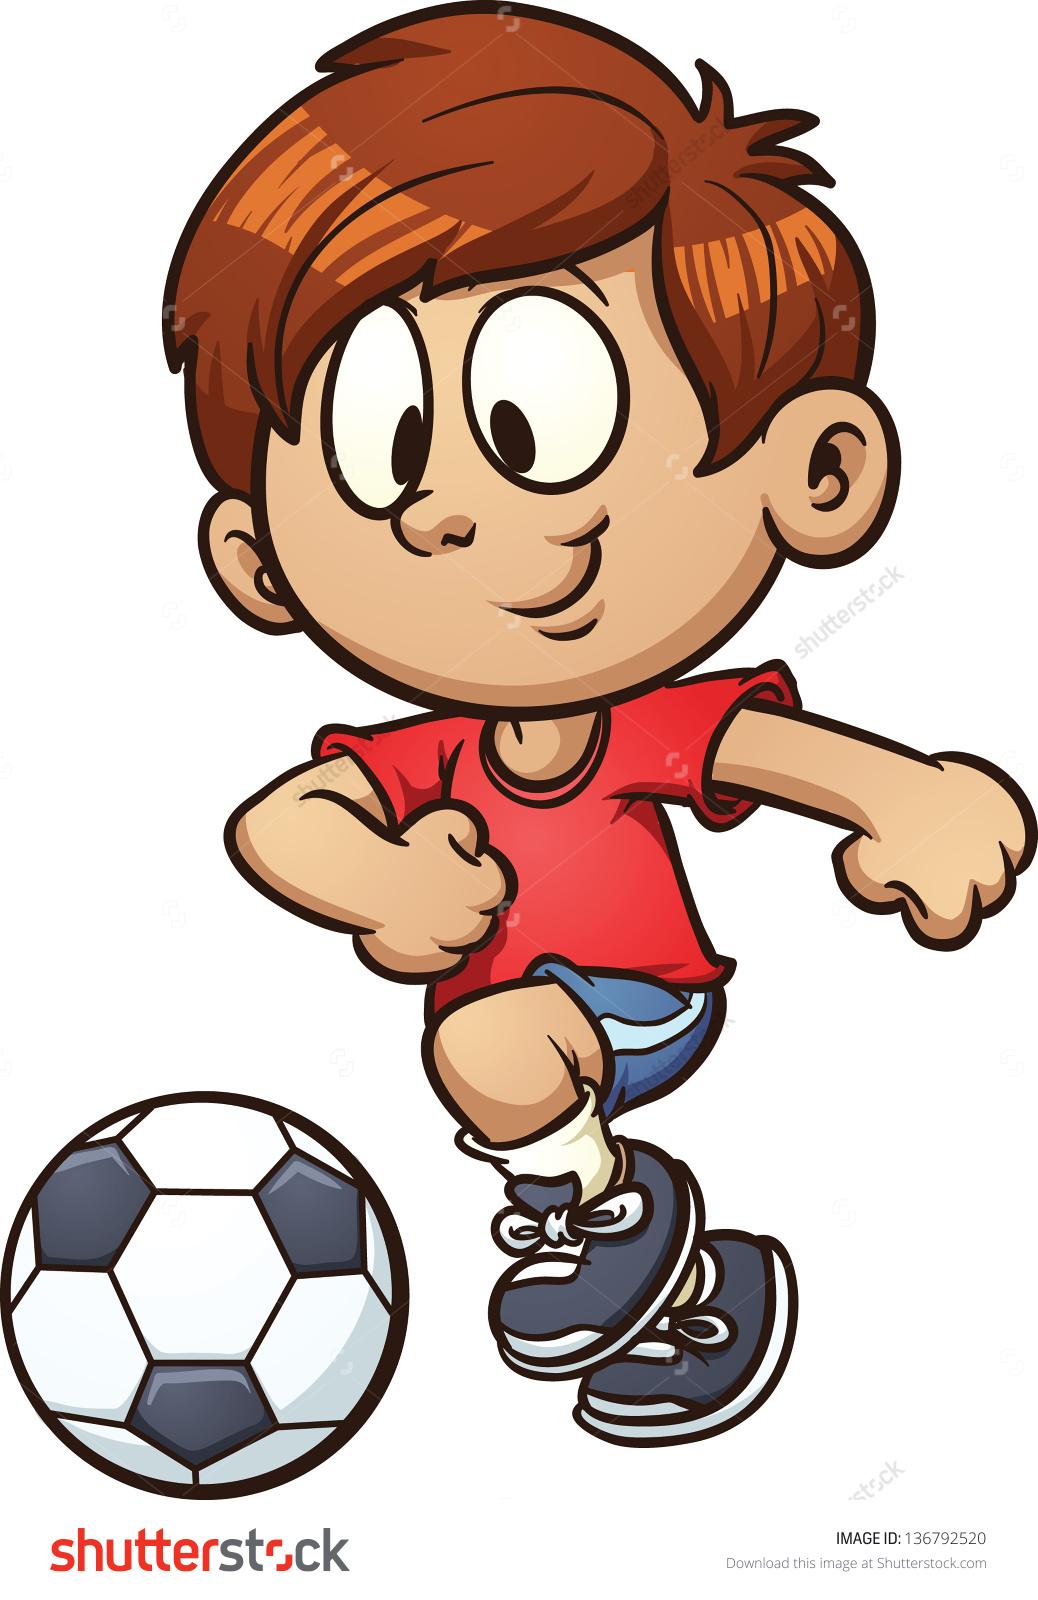 Boy Playing Football Clipart - ClipArt Best (1038 x 1600 Pixel)